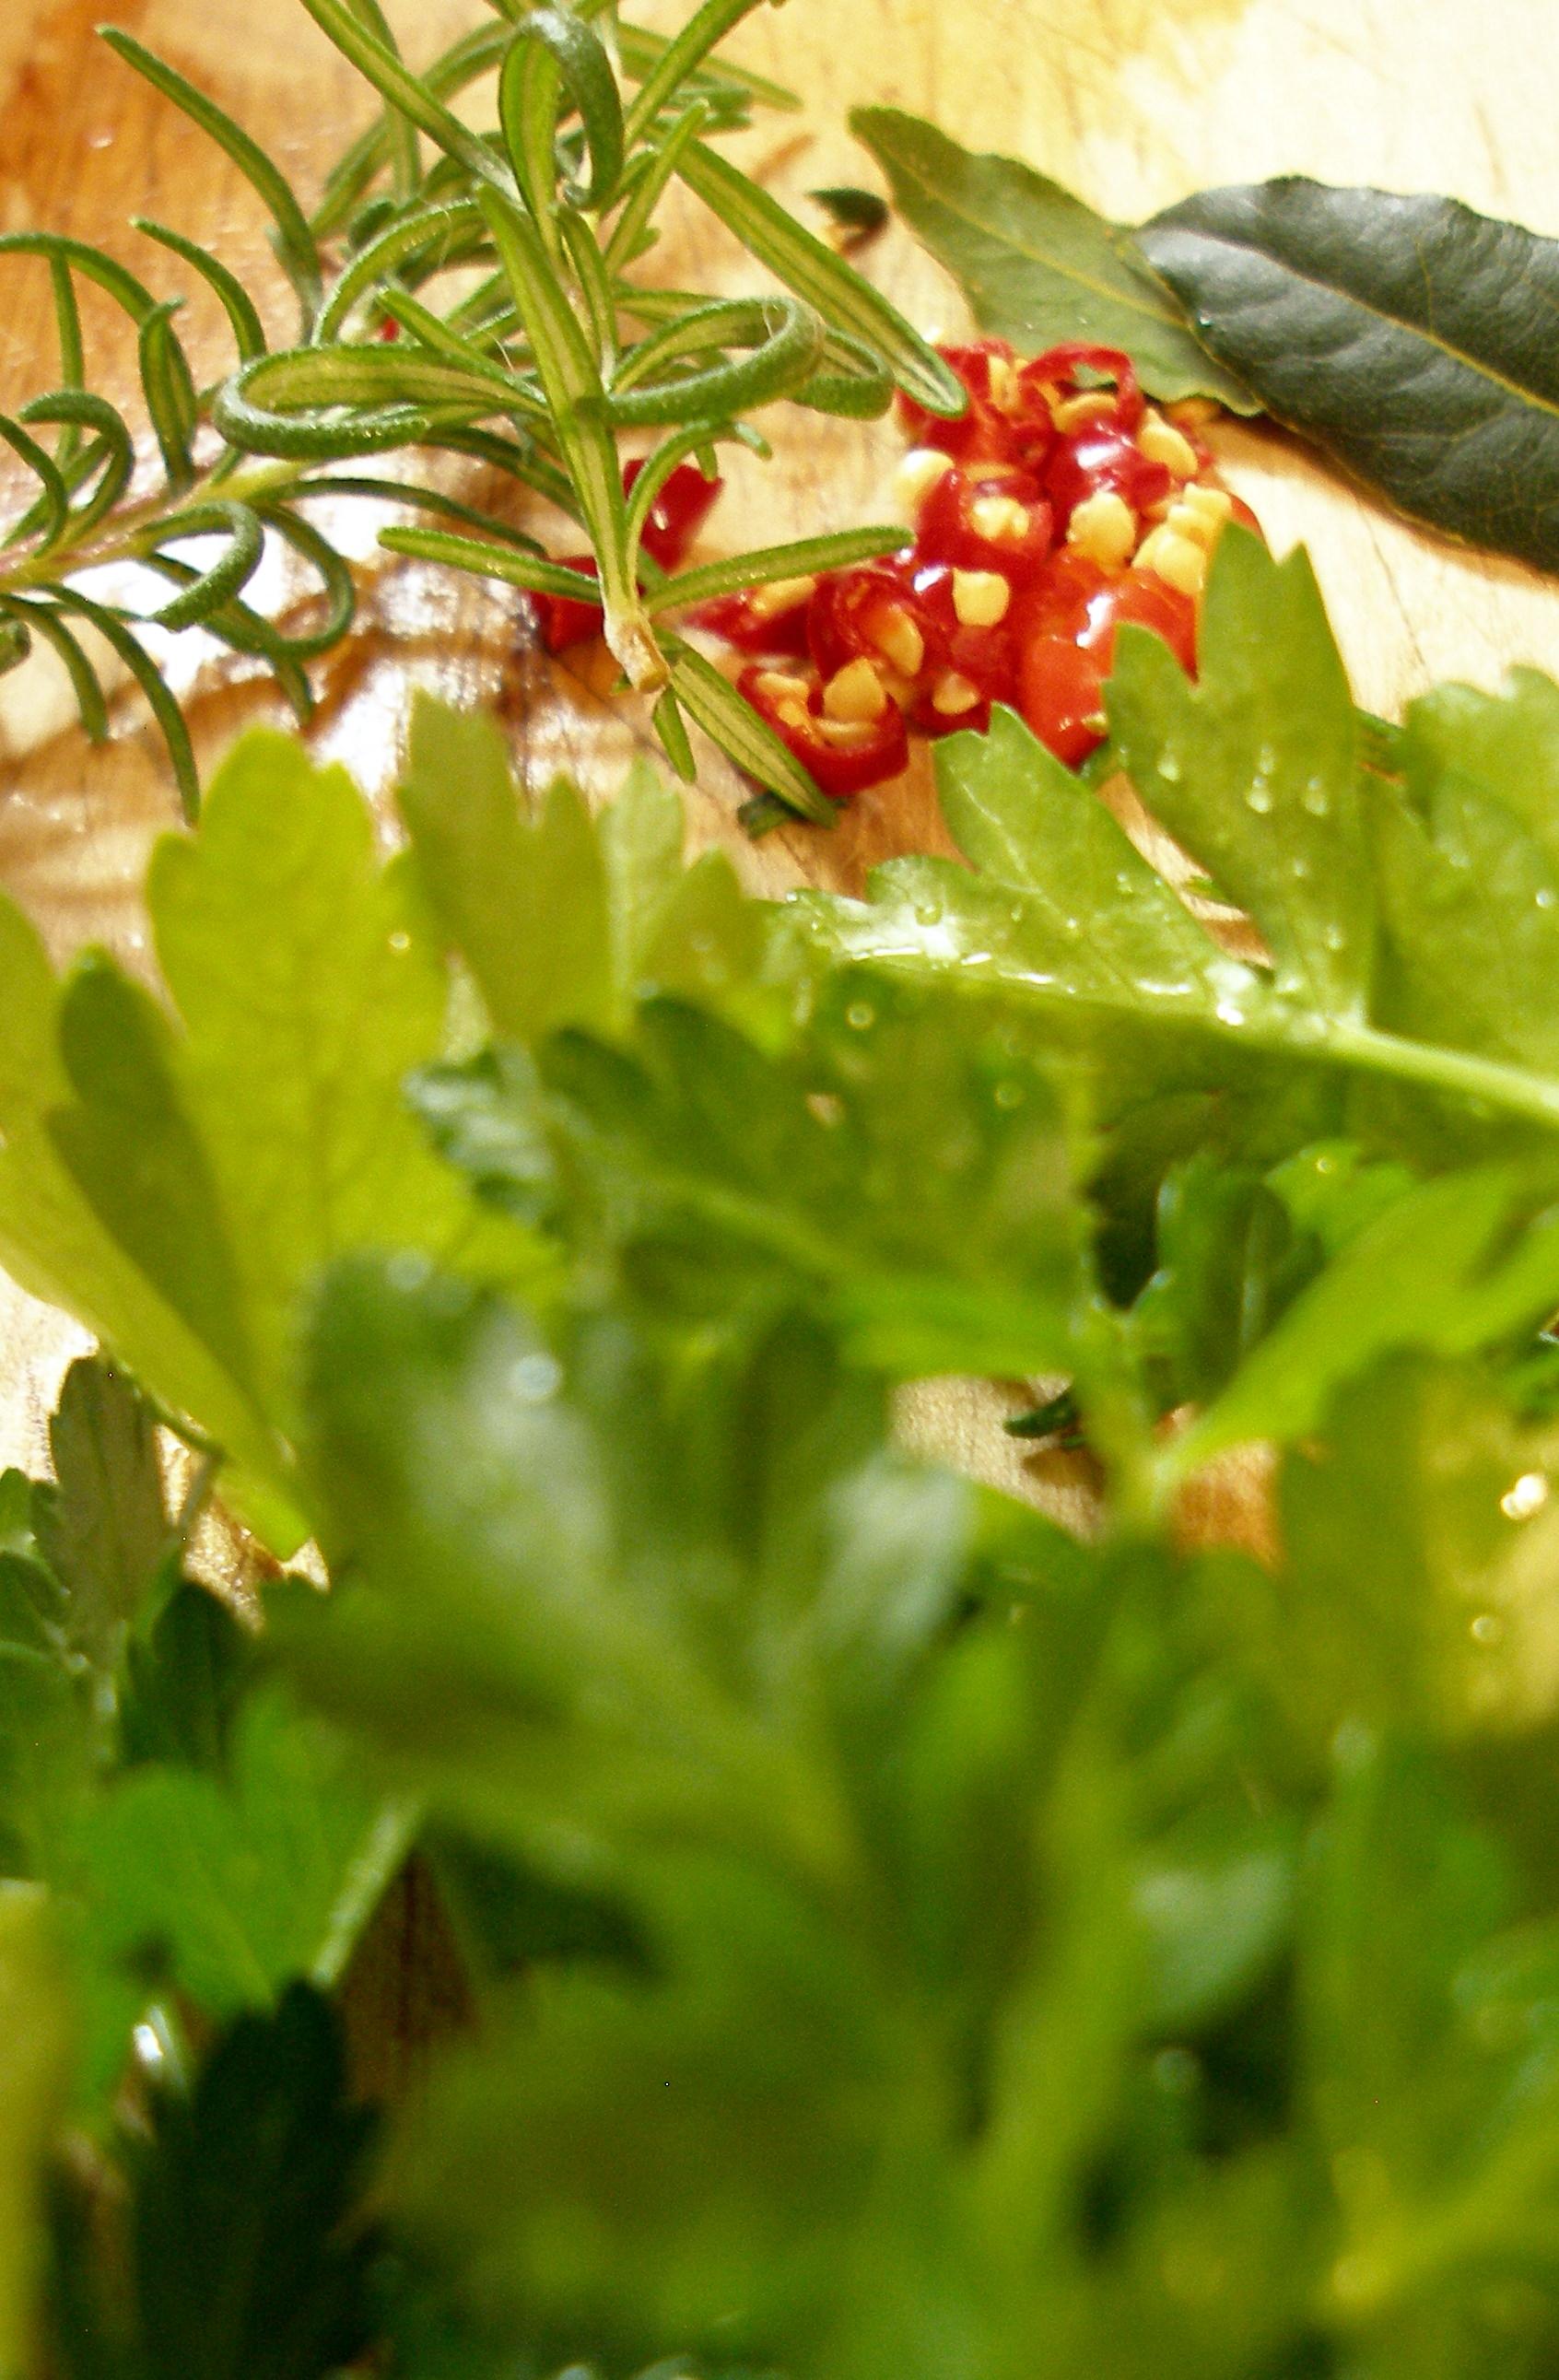 parsley, rosemary, bay, thai chilies